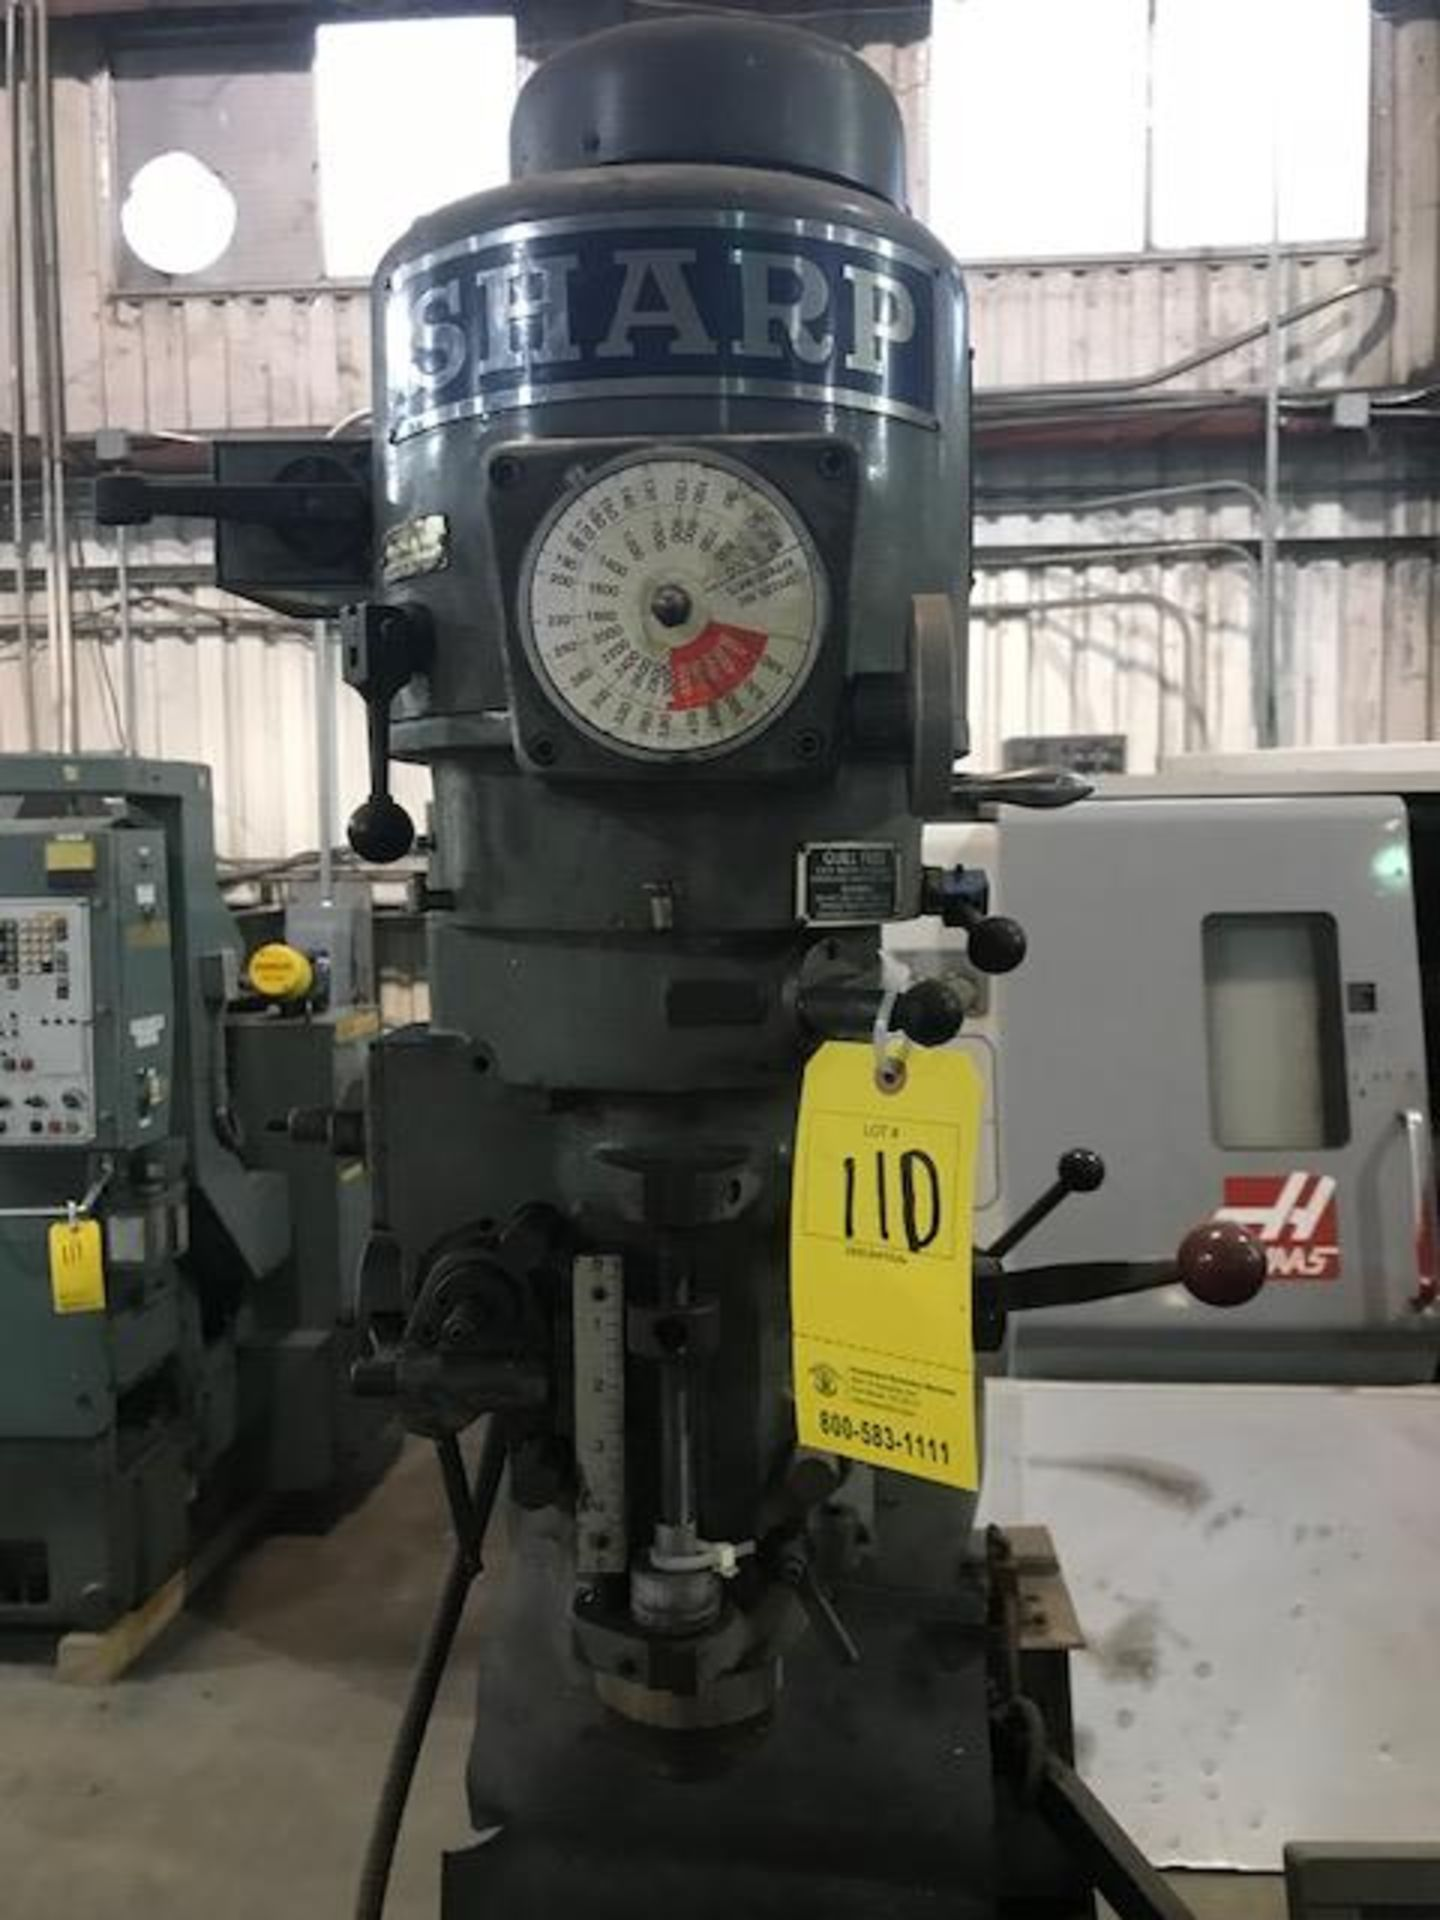 "Lot 110 - Sharp Milling Machine, Table: 9"" x 42"", 5"" Quill, RPM- 60-4500, heidenhain DRO (LOCATION: 3421 N"